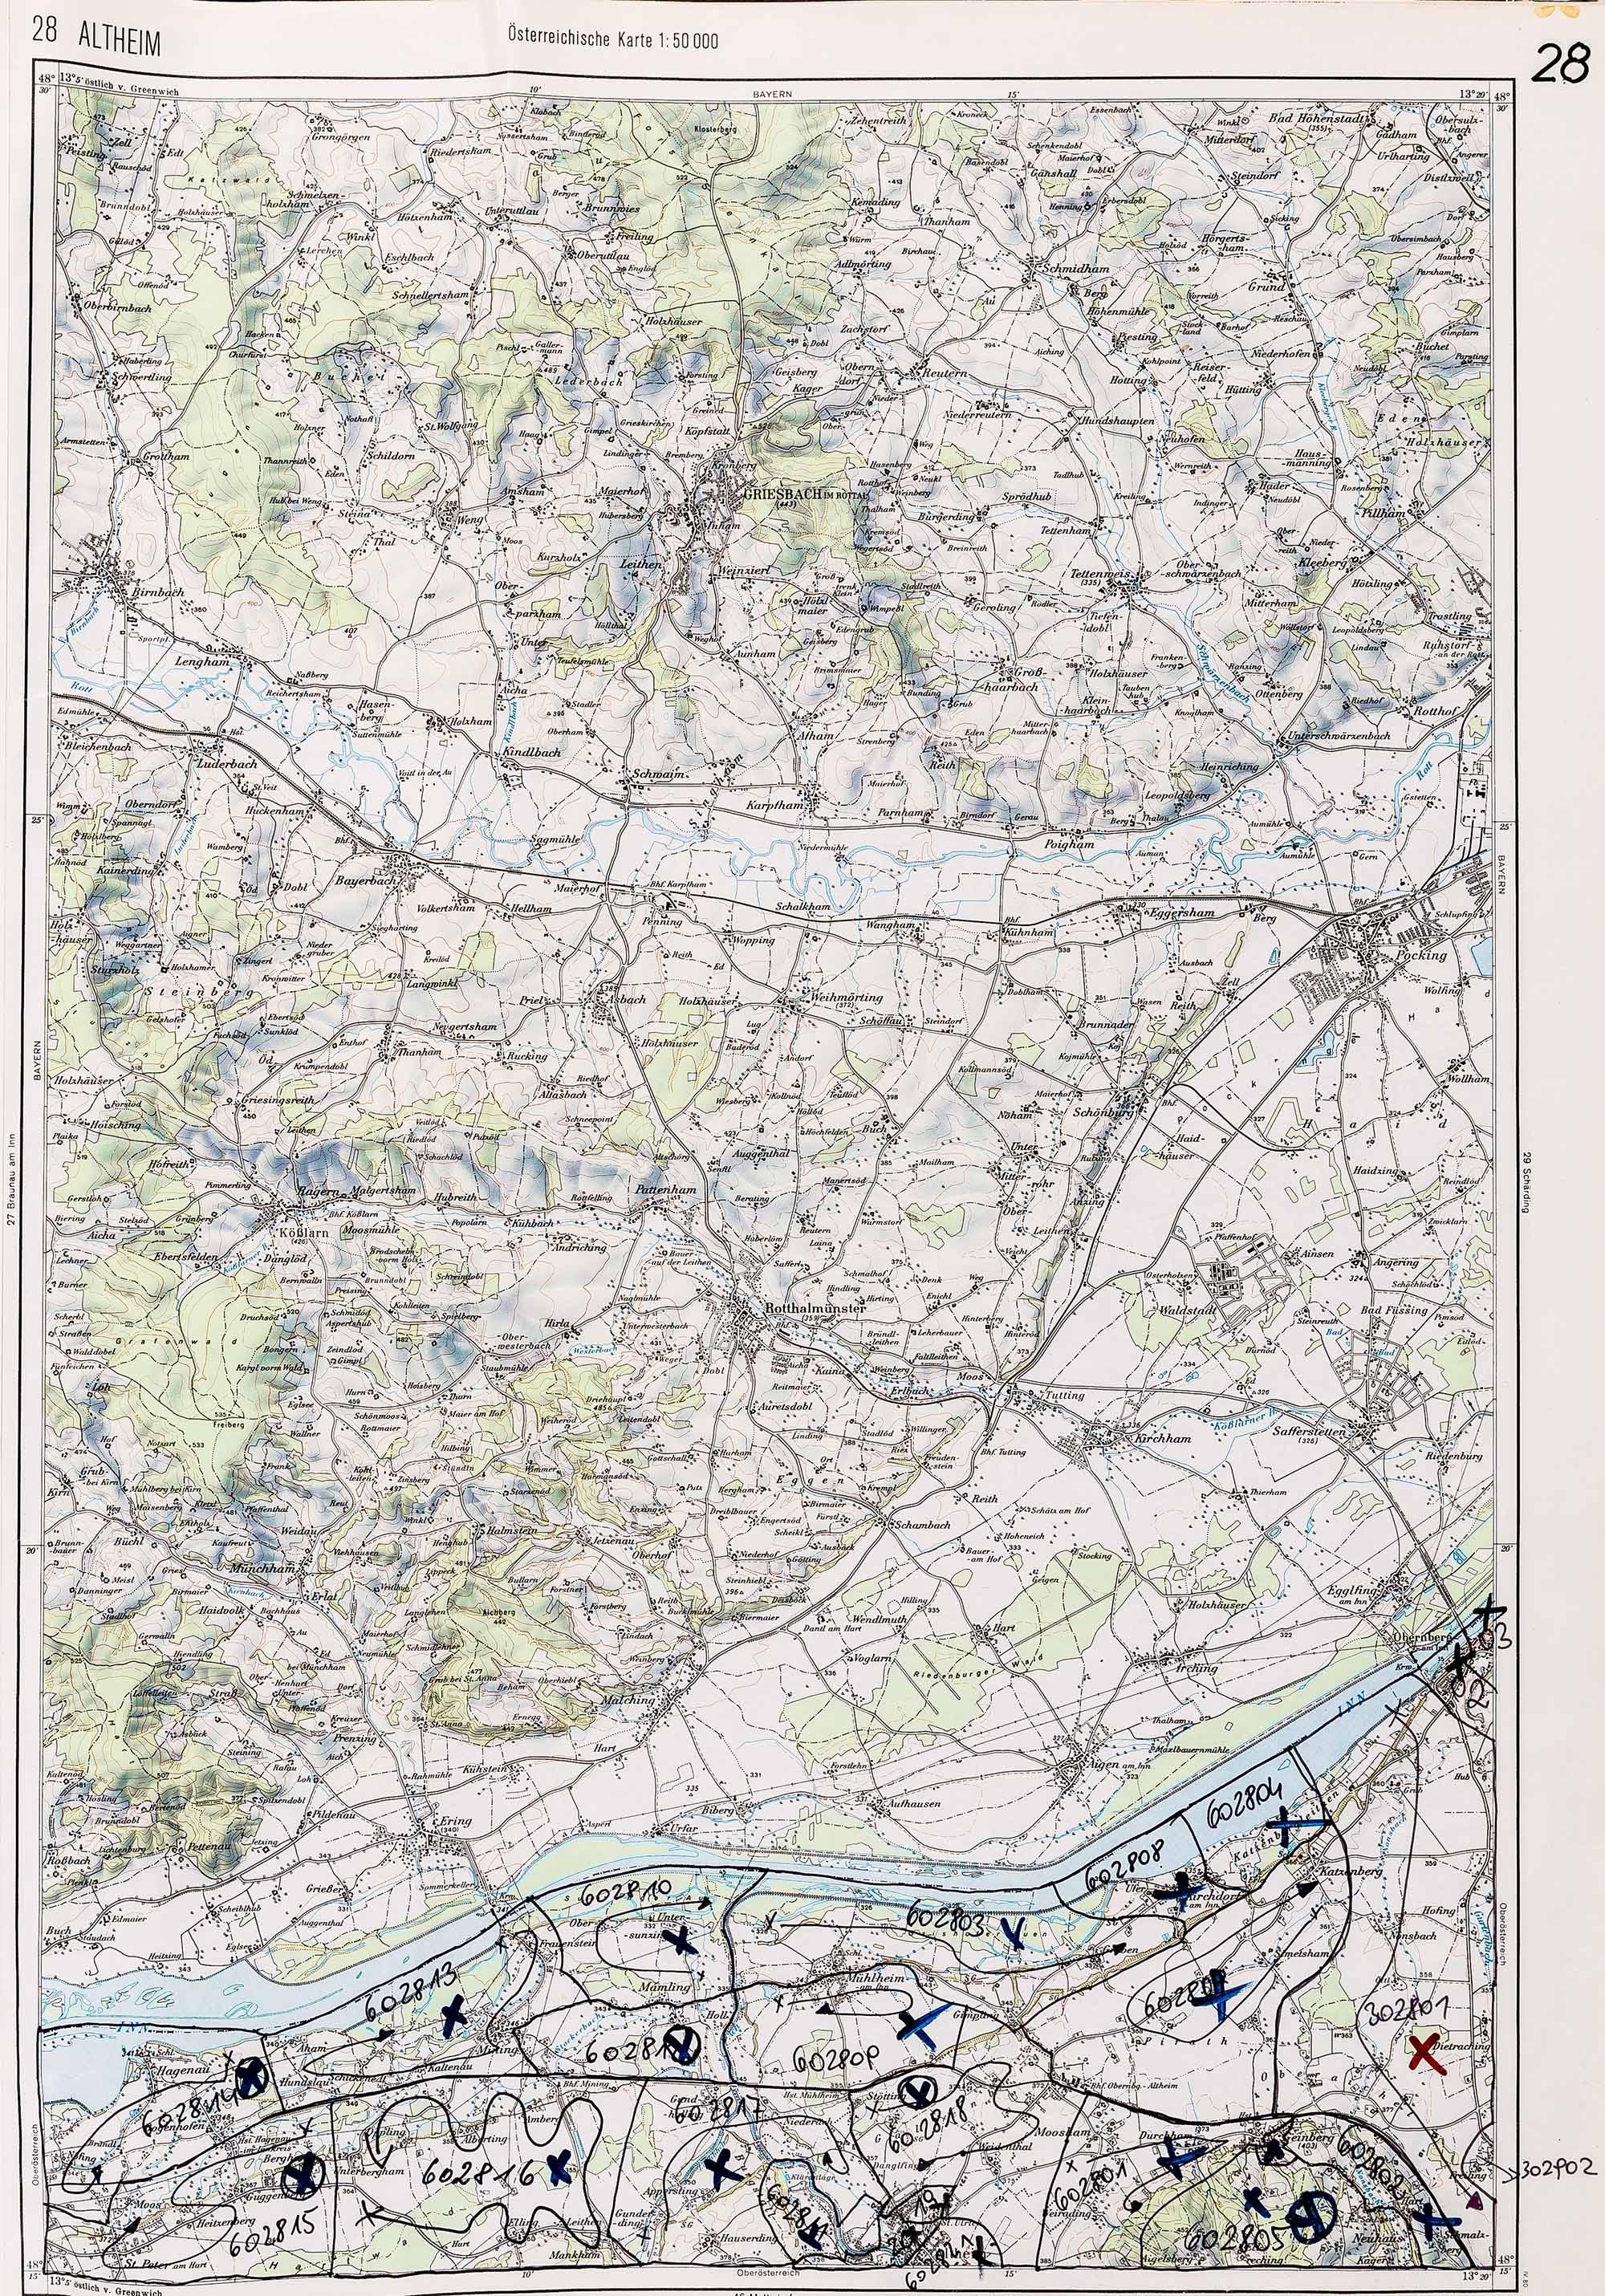 1983-1986 Karte 028